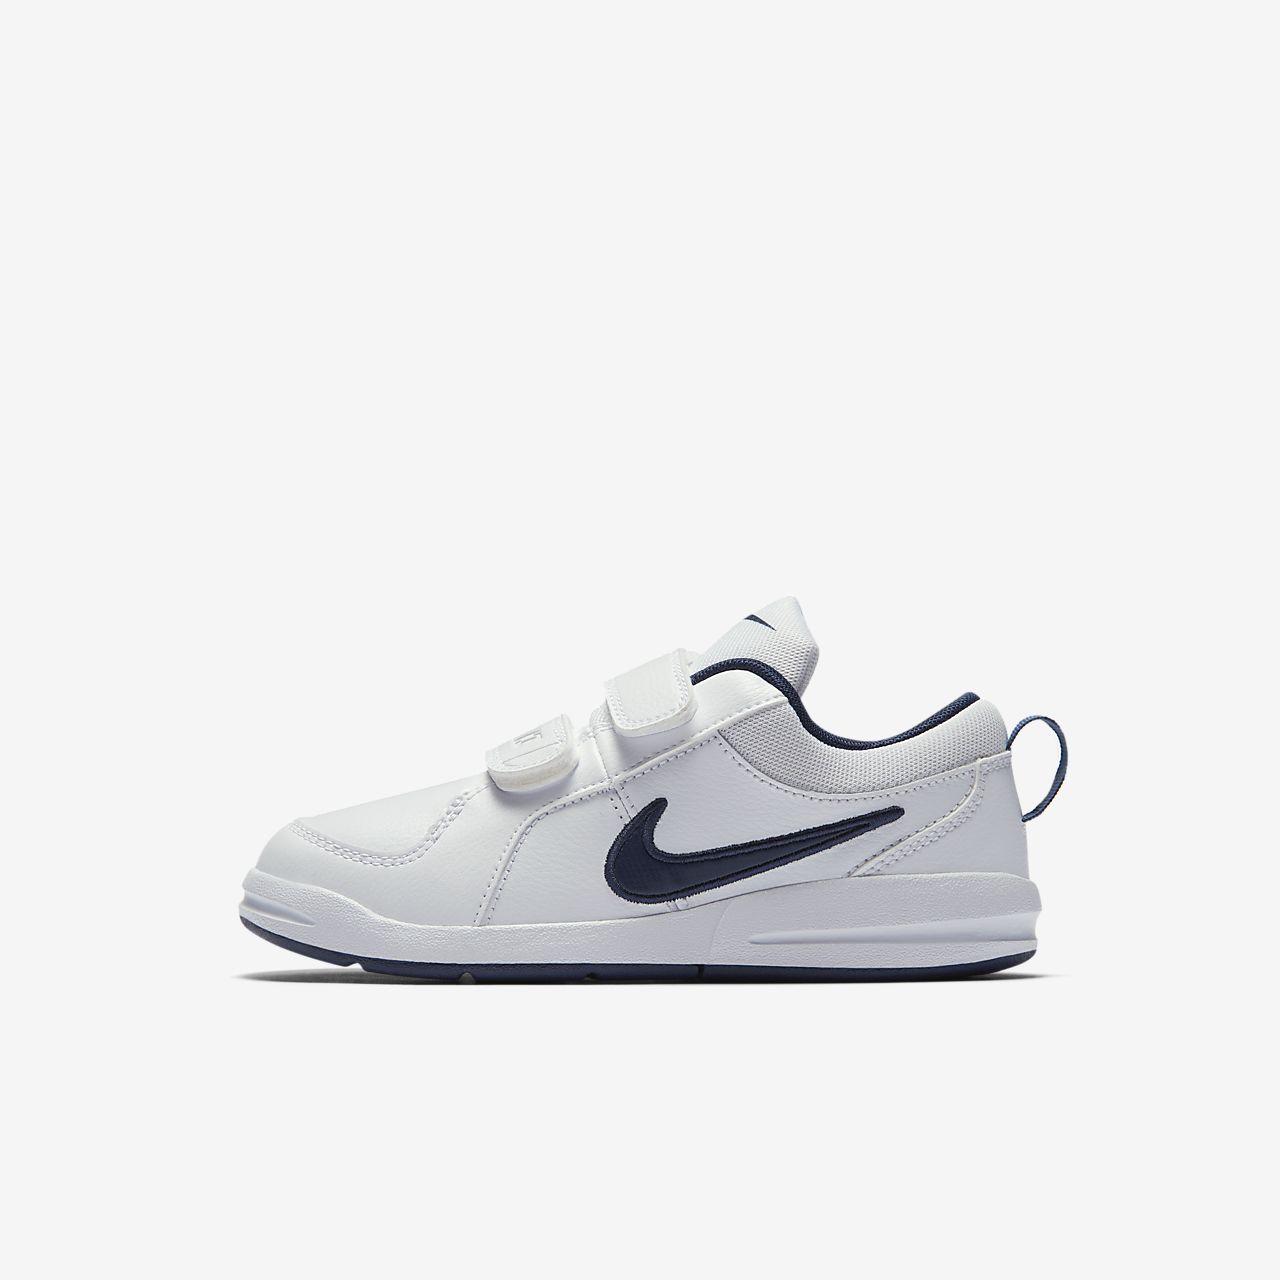 scarpe nike taglia 35 ragazzo